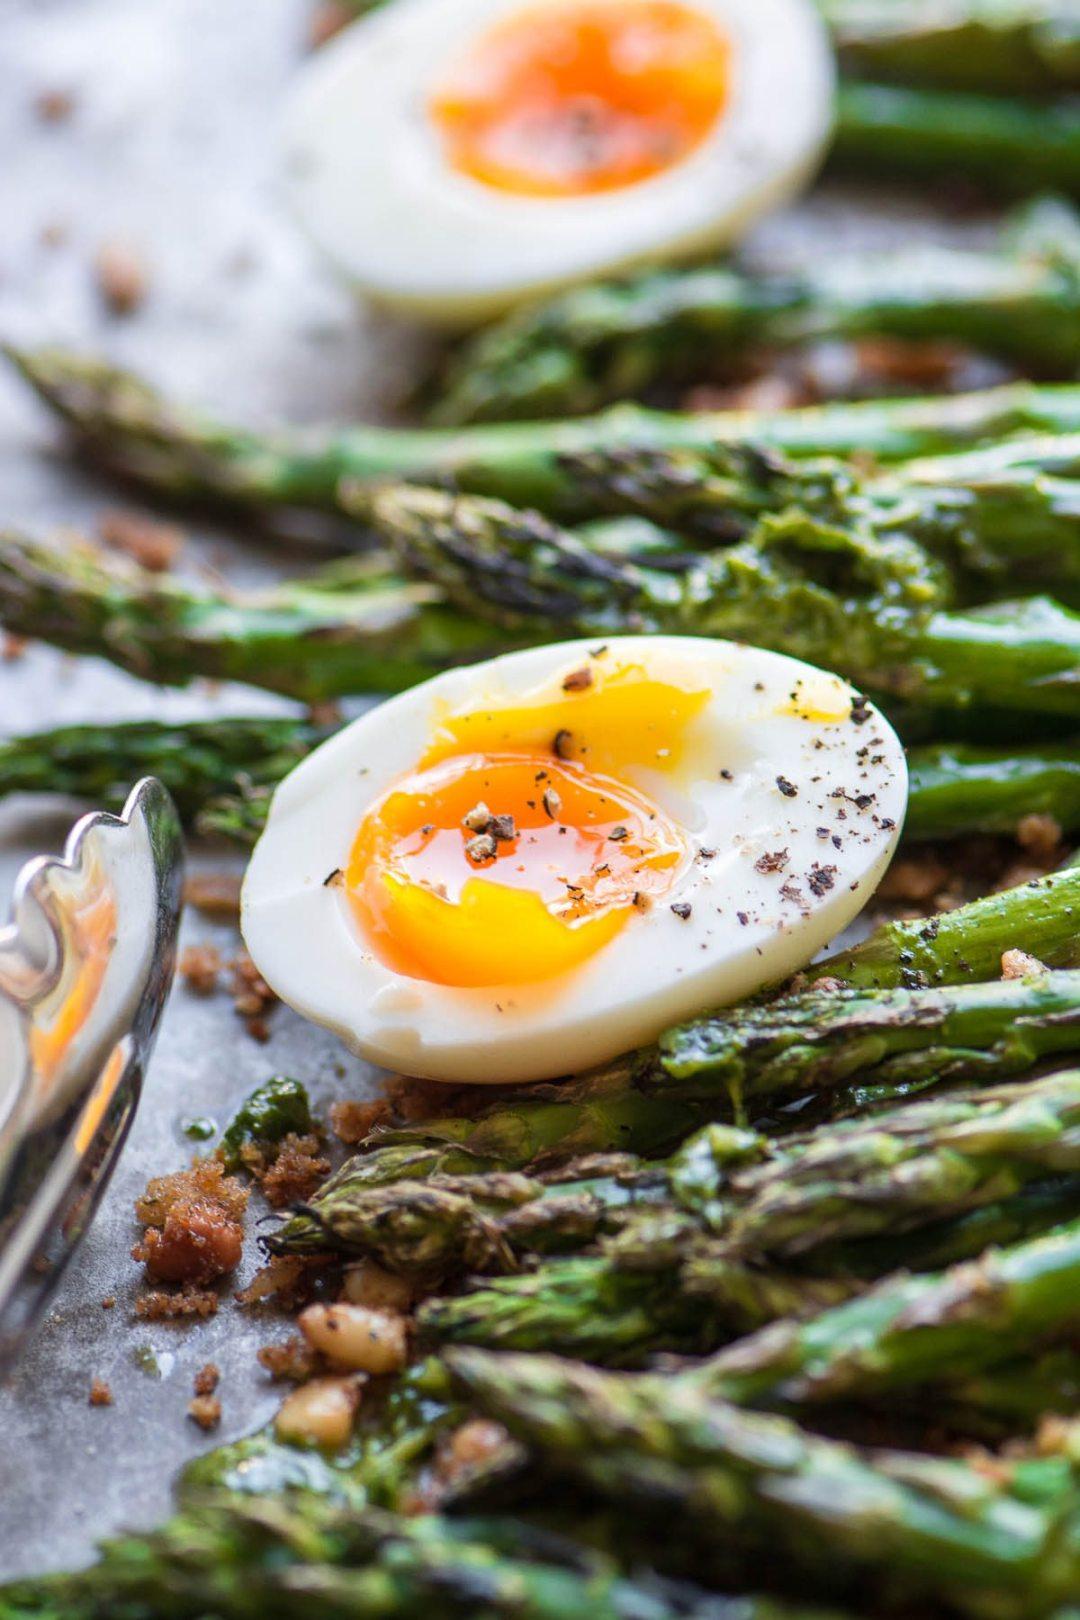 Roasted asparagus with a runny egg